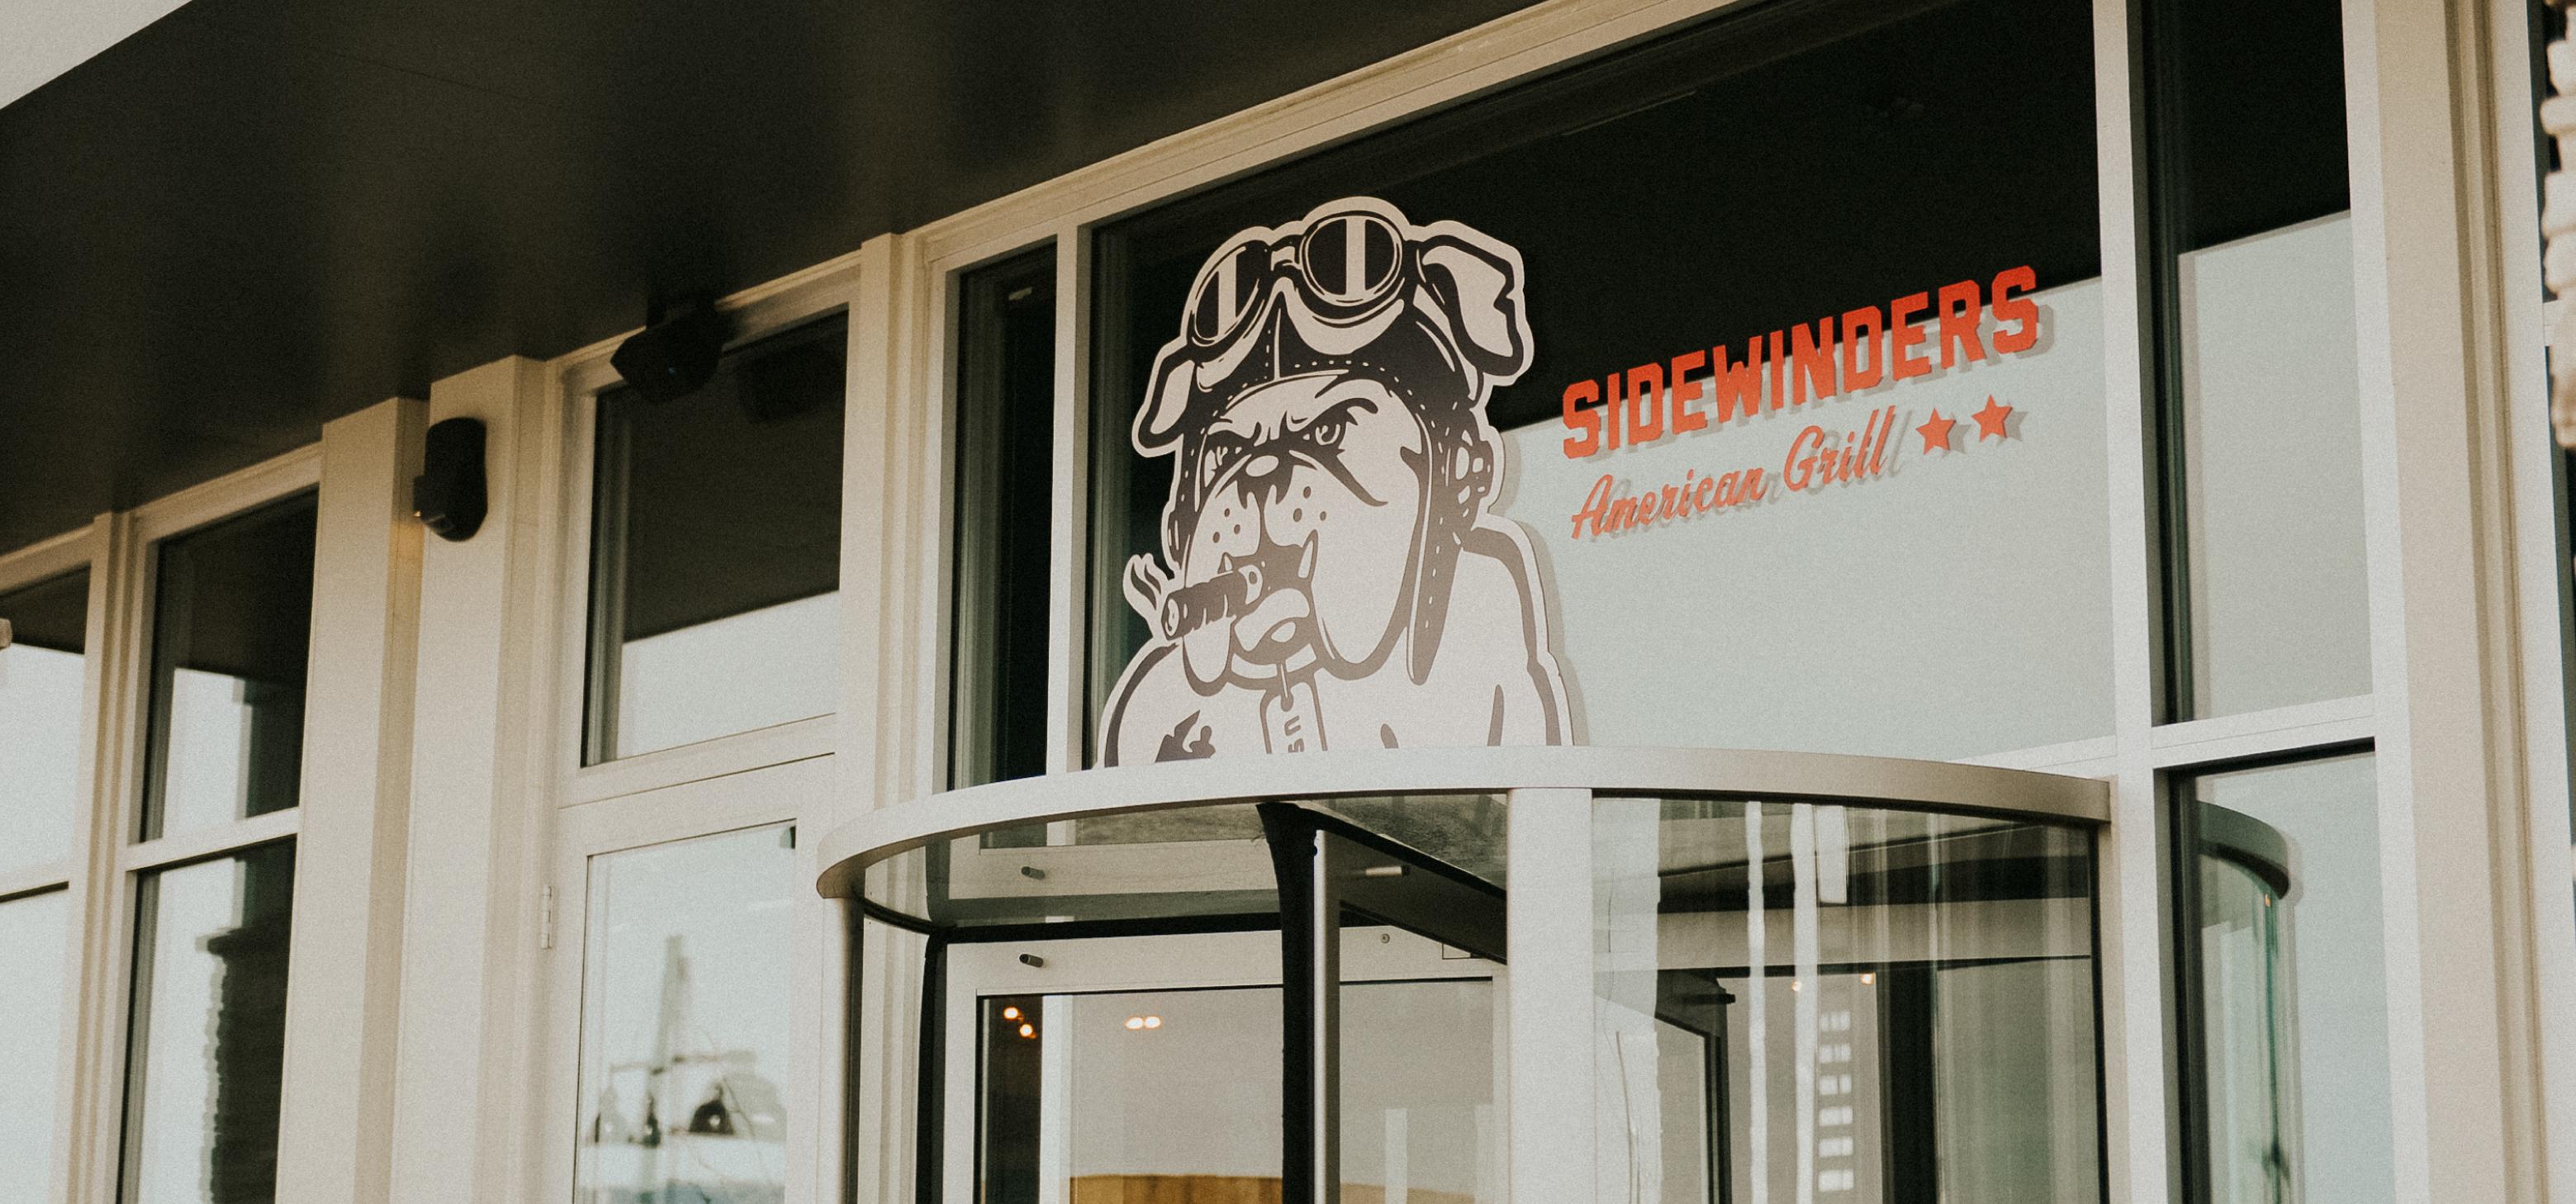 Sidewinders American Grill